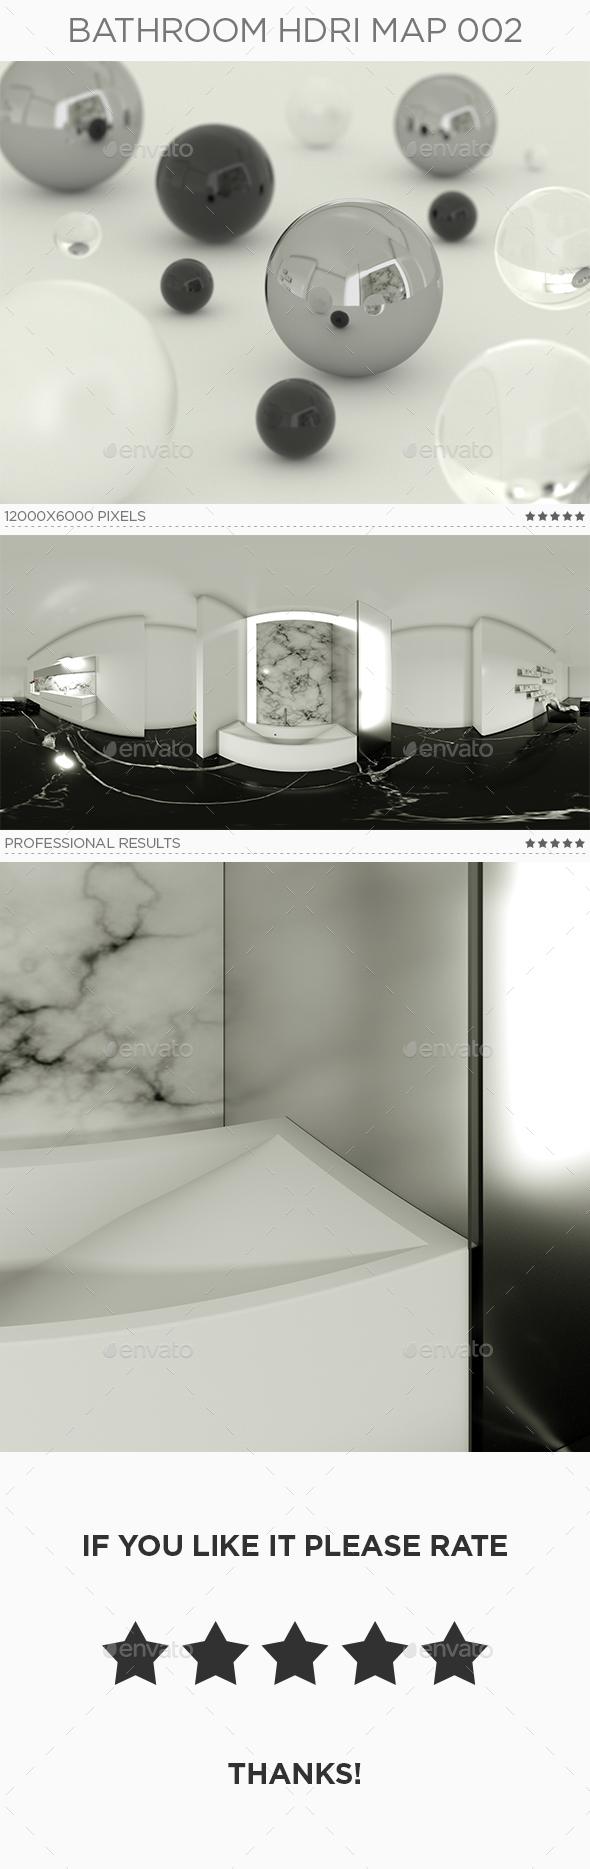 Bathroom HDRi Map 002 - 3DOcean Item for Sale